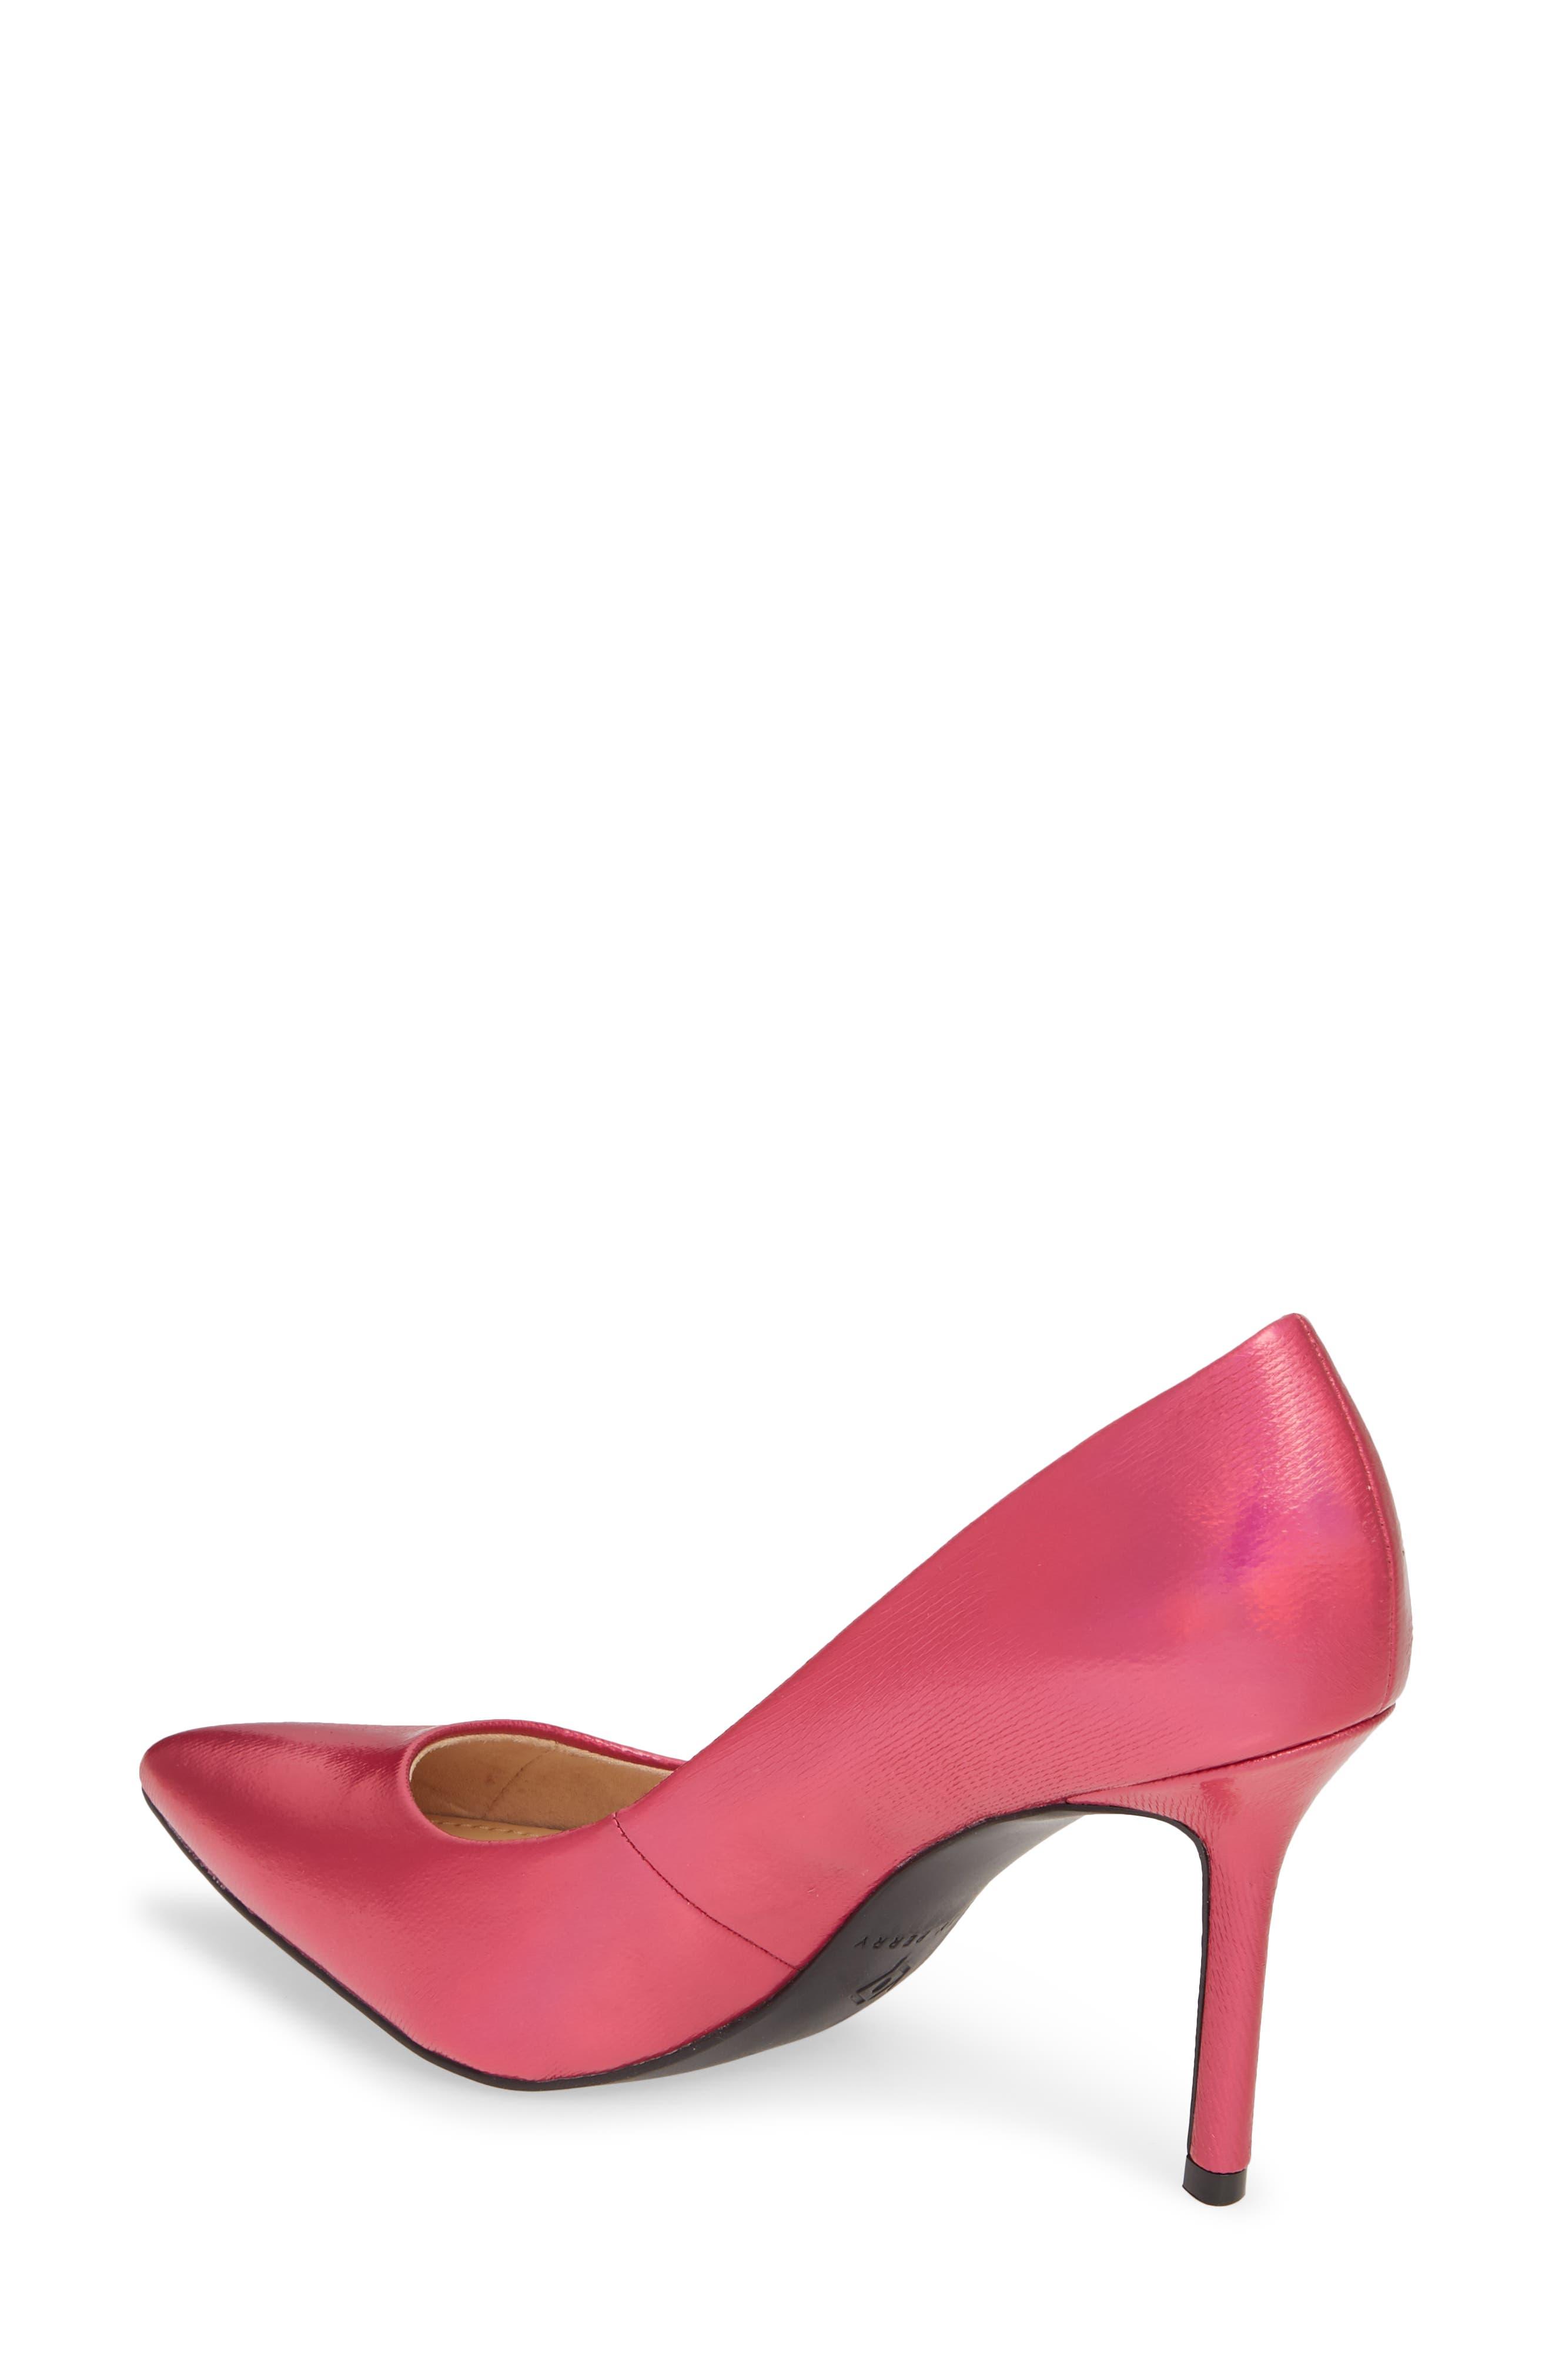 e96513ba43 Women s Katy Perry Shoes